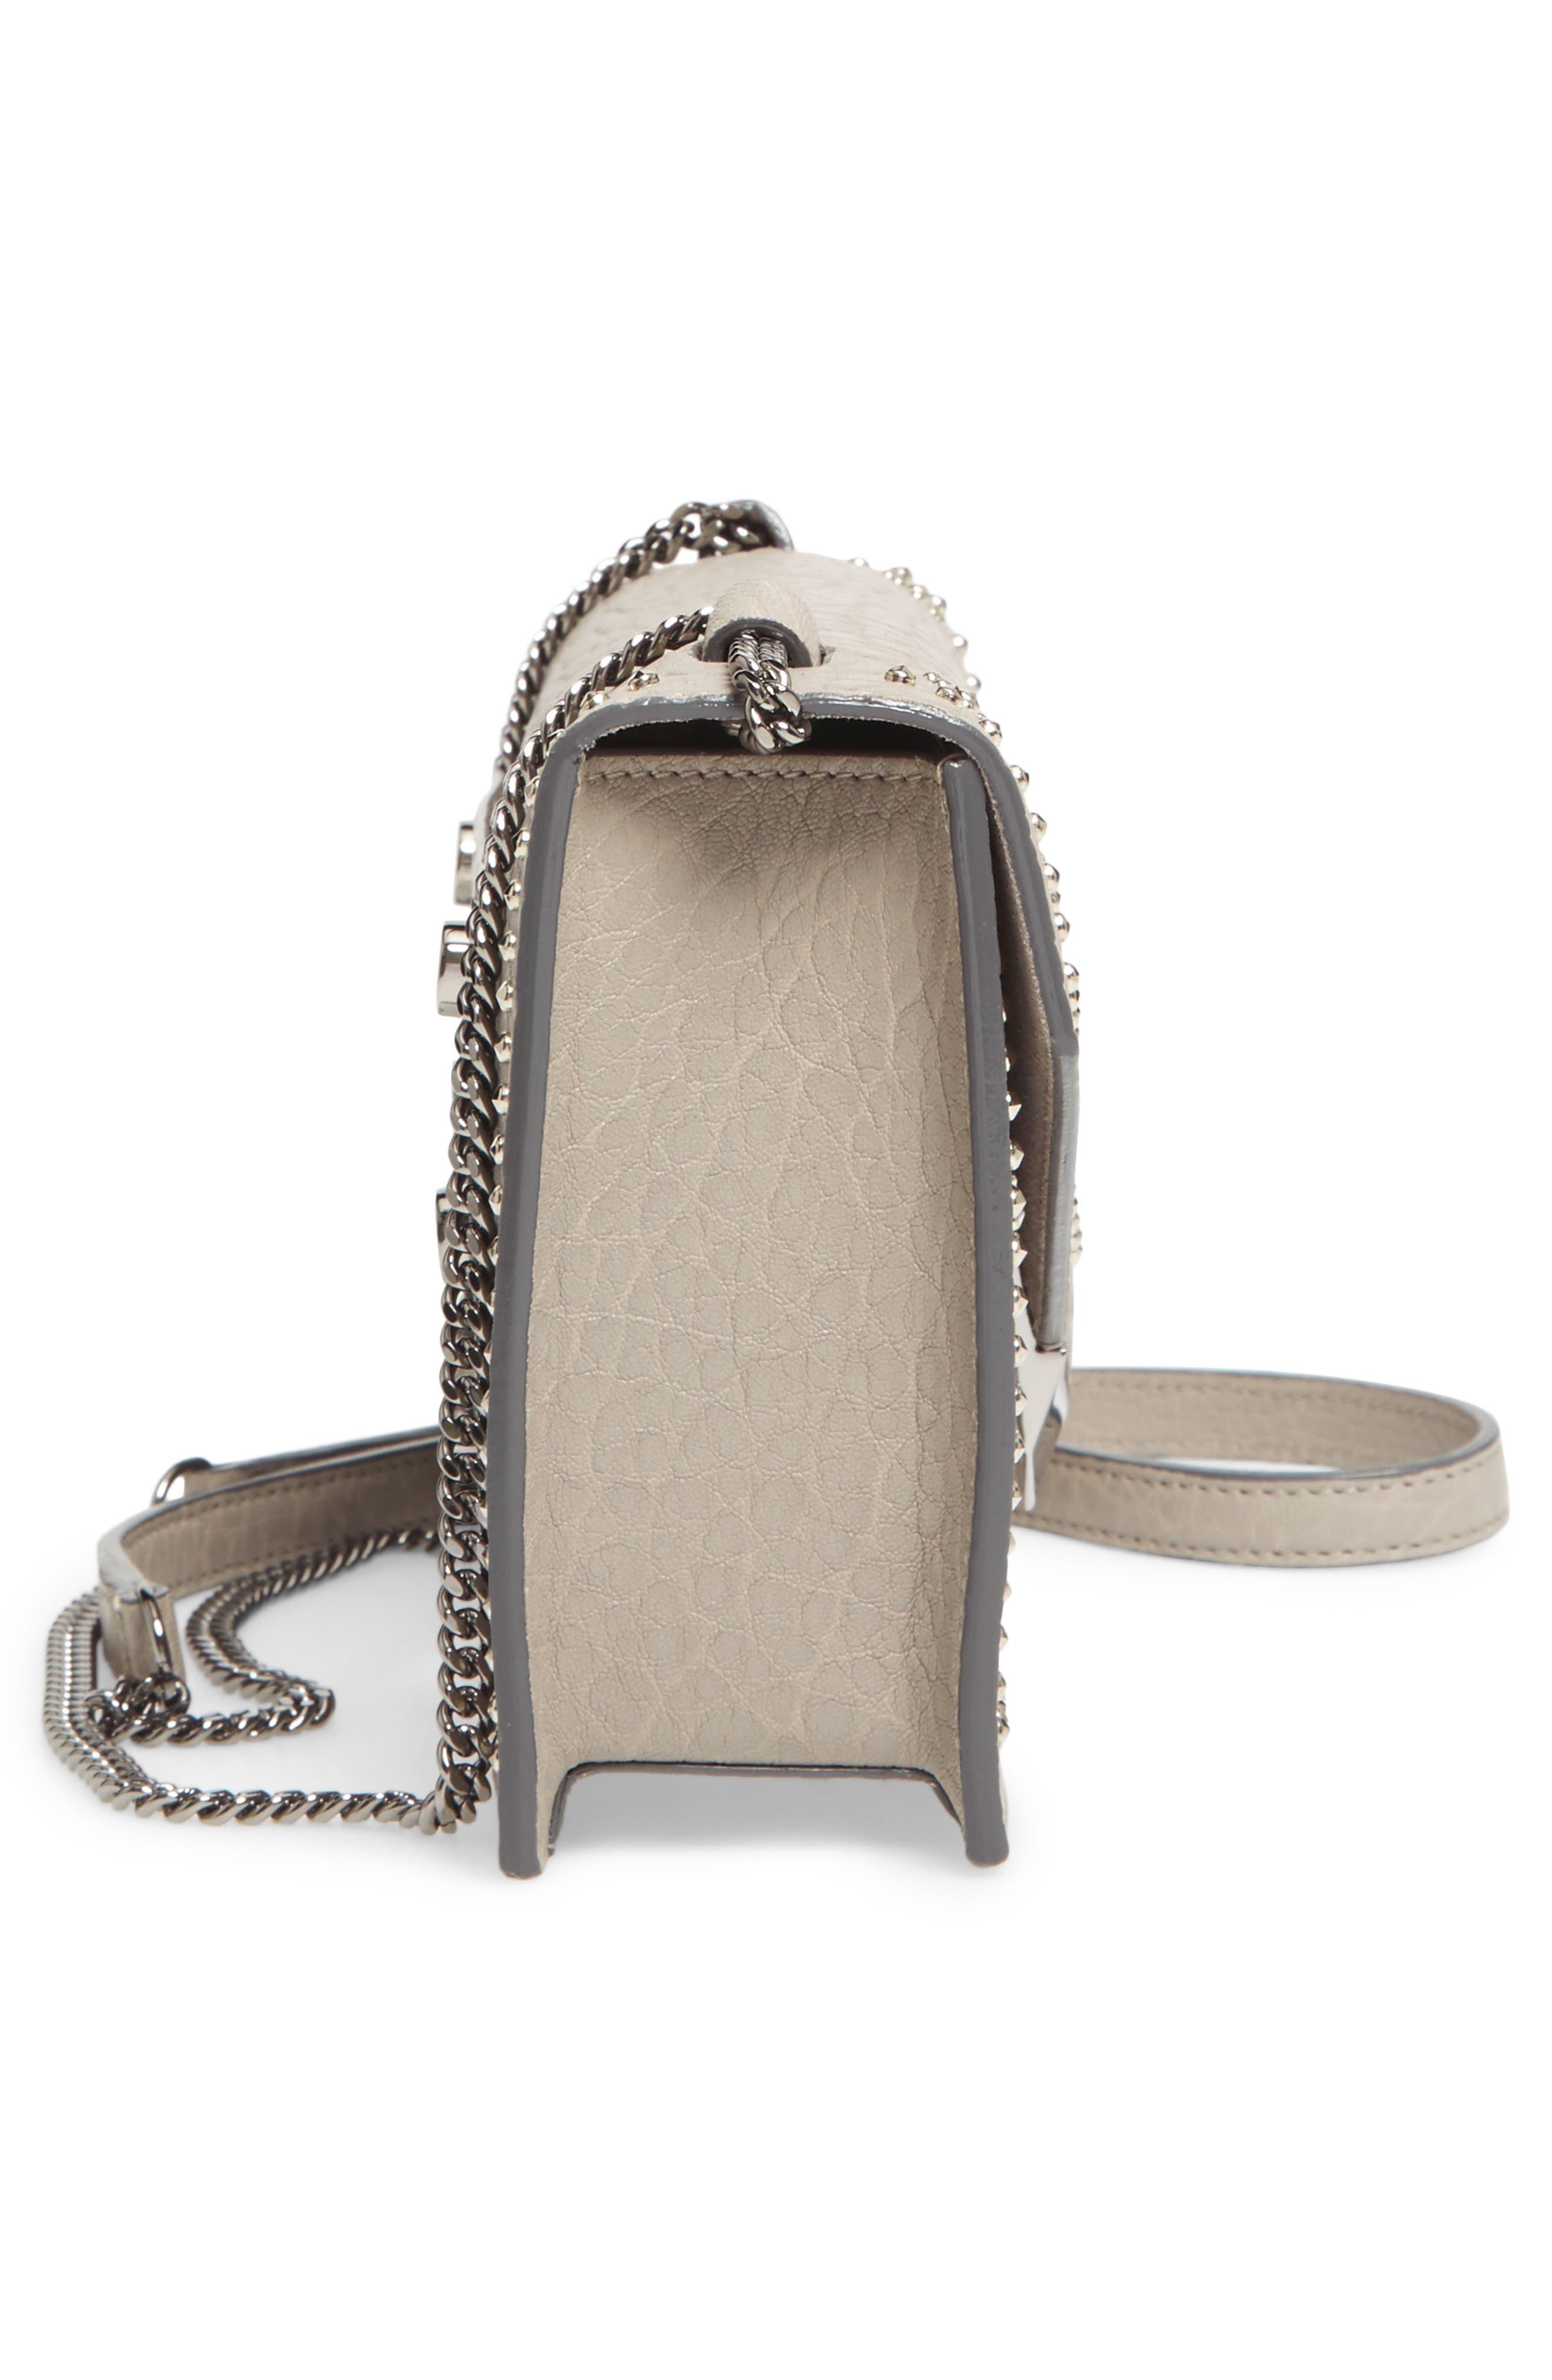 Leila Grainy Lambskin Leather Crossbody Bag,                             Alternate thumbnail 5, color,                             040